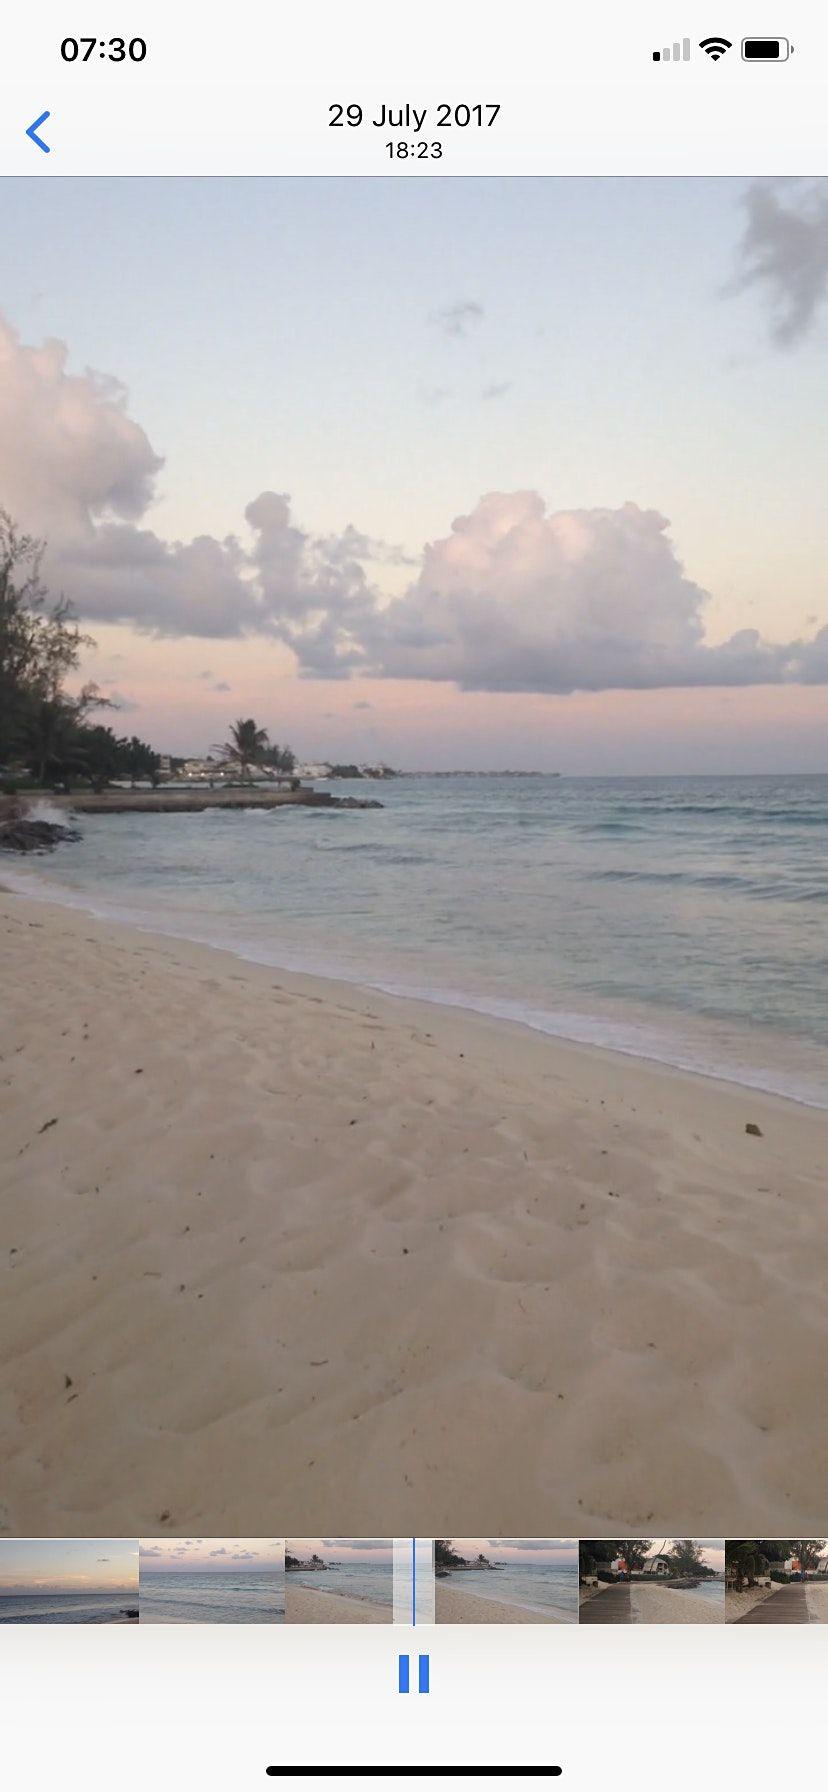 Be a Travel Entrepreneur - Fort Lauderdale